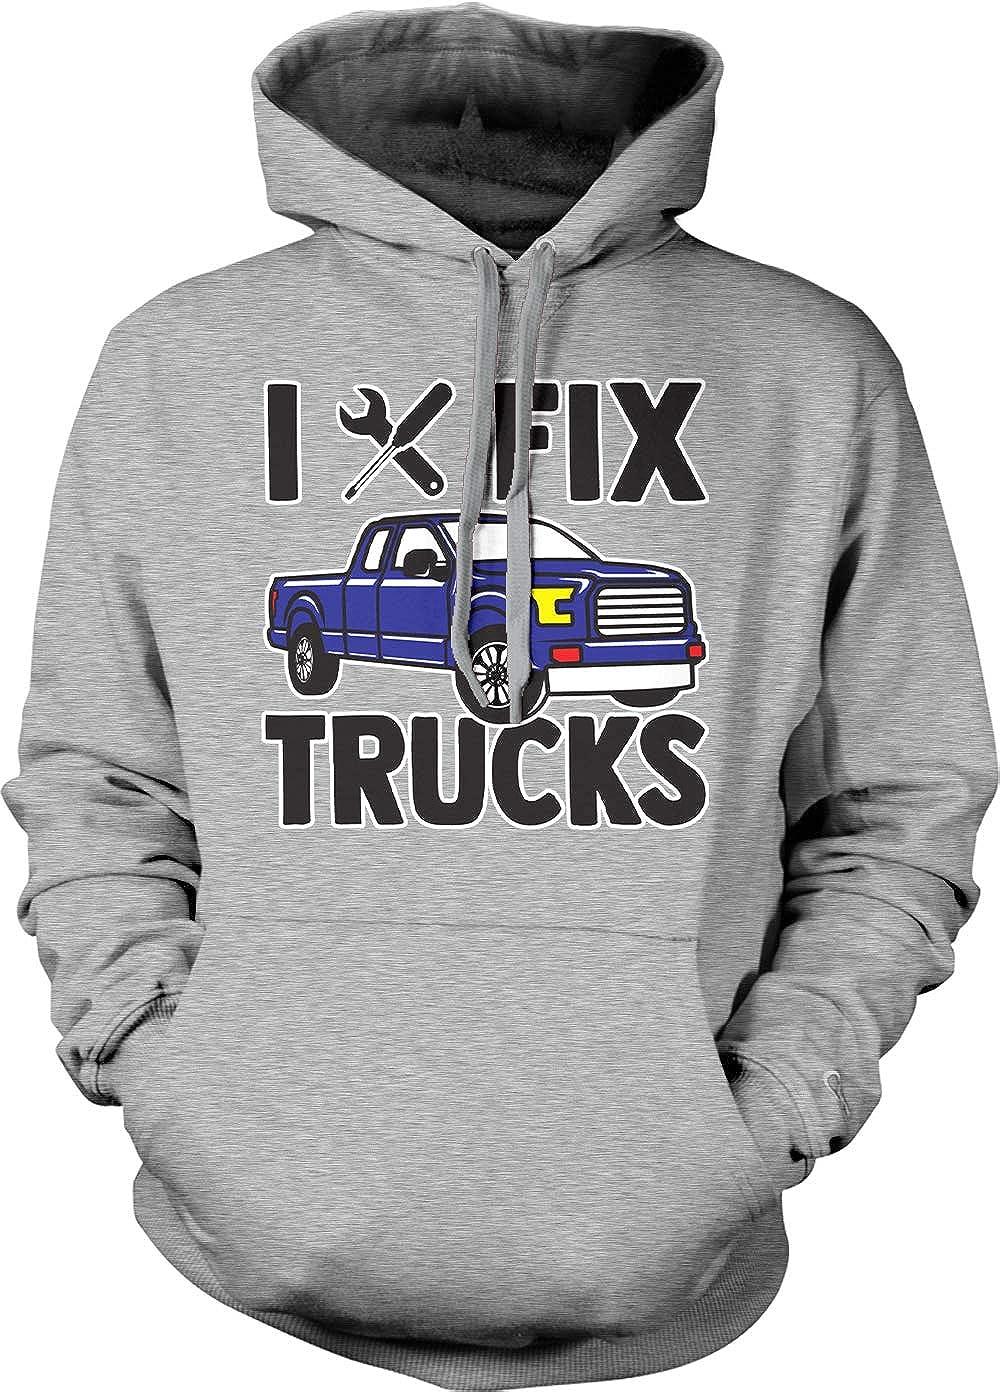 I Fix Trucks Auto Mechanic Gearhead Unisex Hoodie Sweatshirt